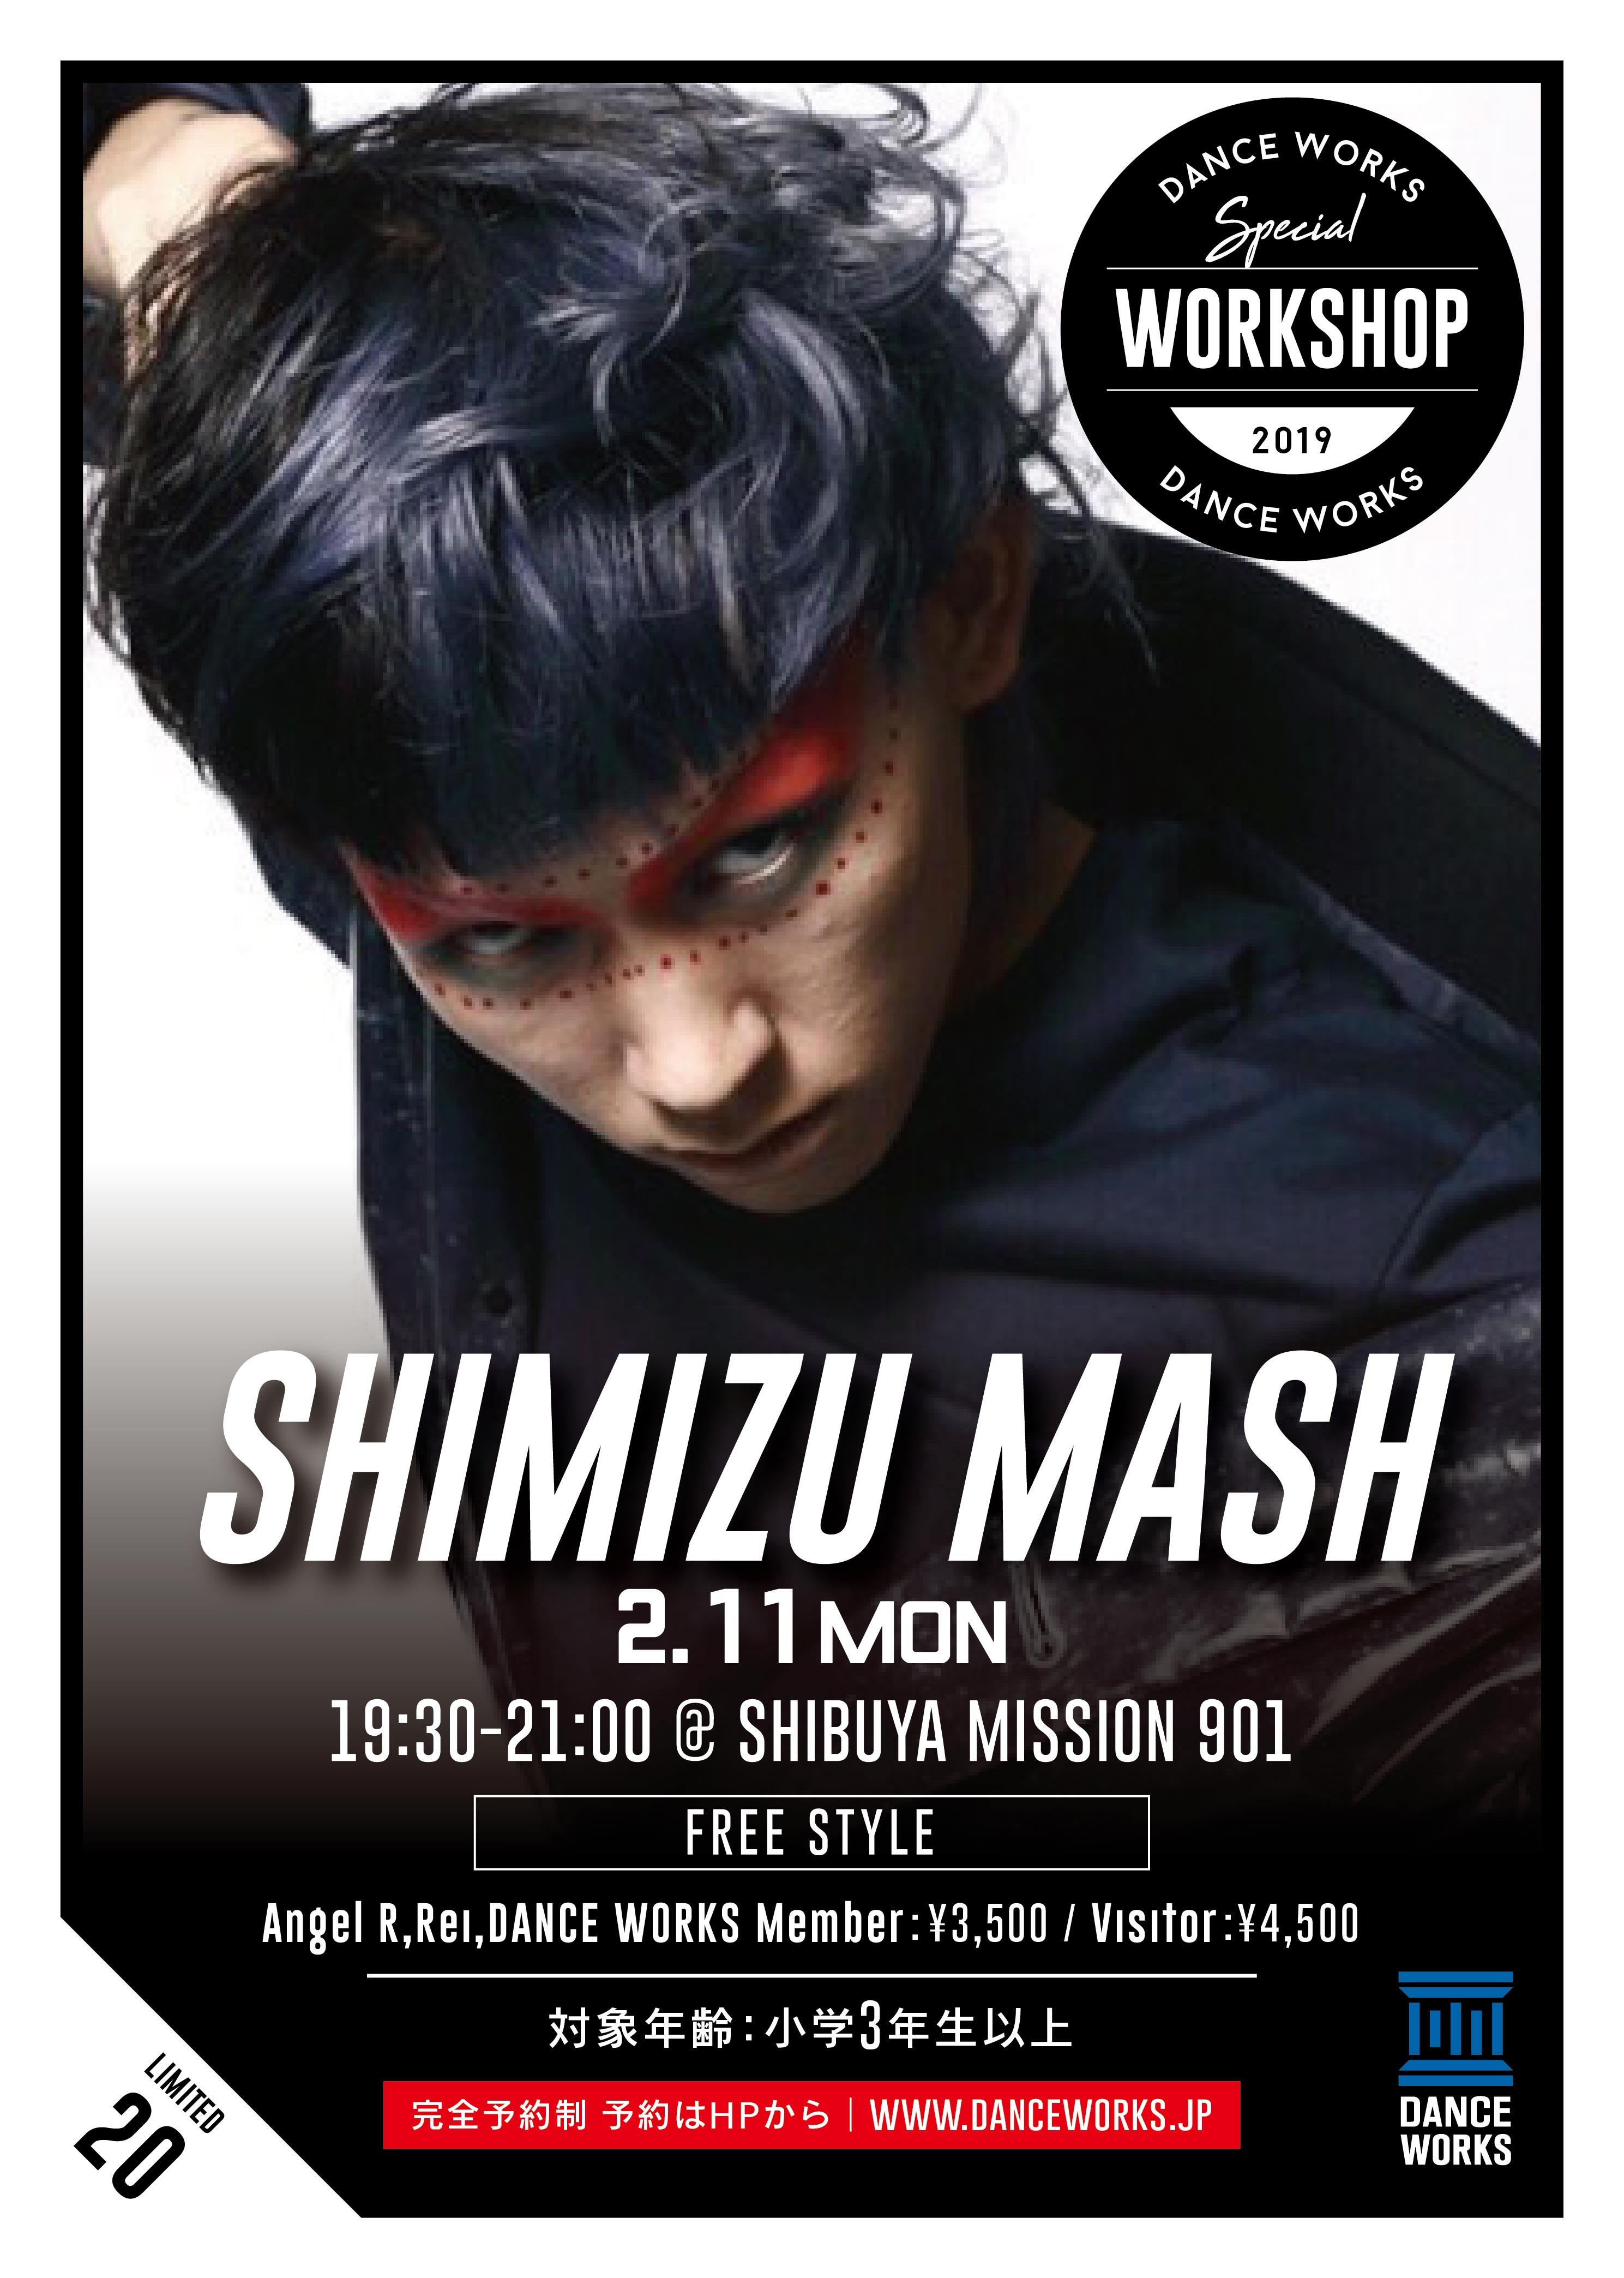 SHIMIZUMASH_POP-01